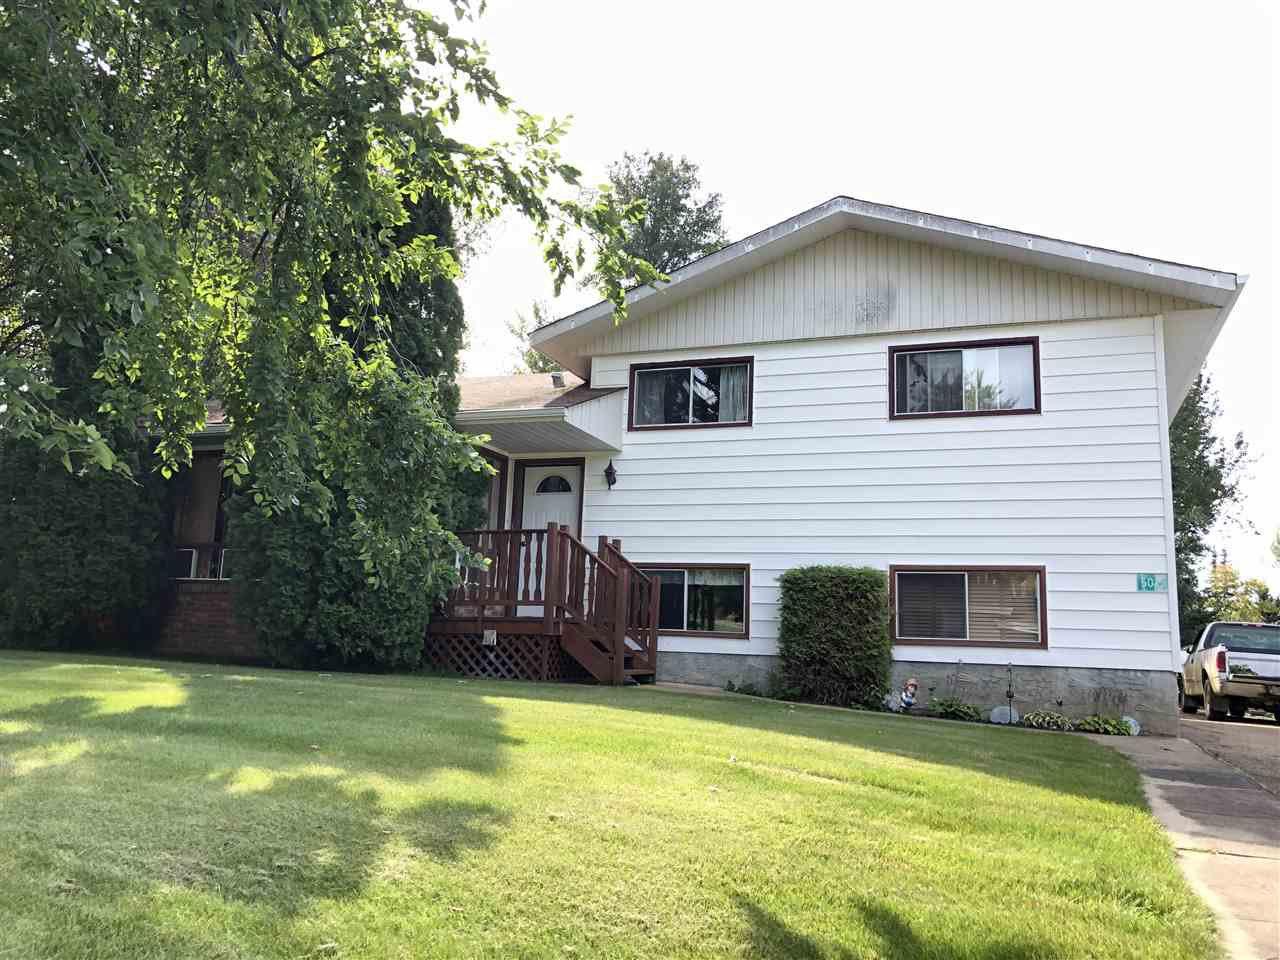 Main Photo: 5015 51 Street: Jarvie House for sale : MLS®# E4170693